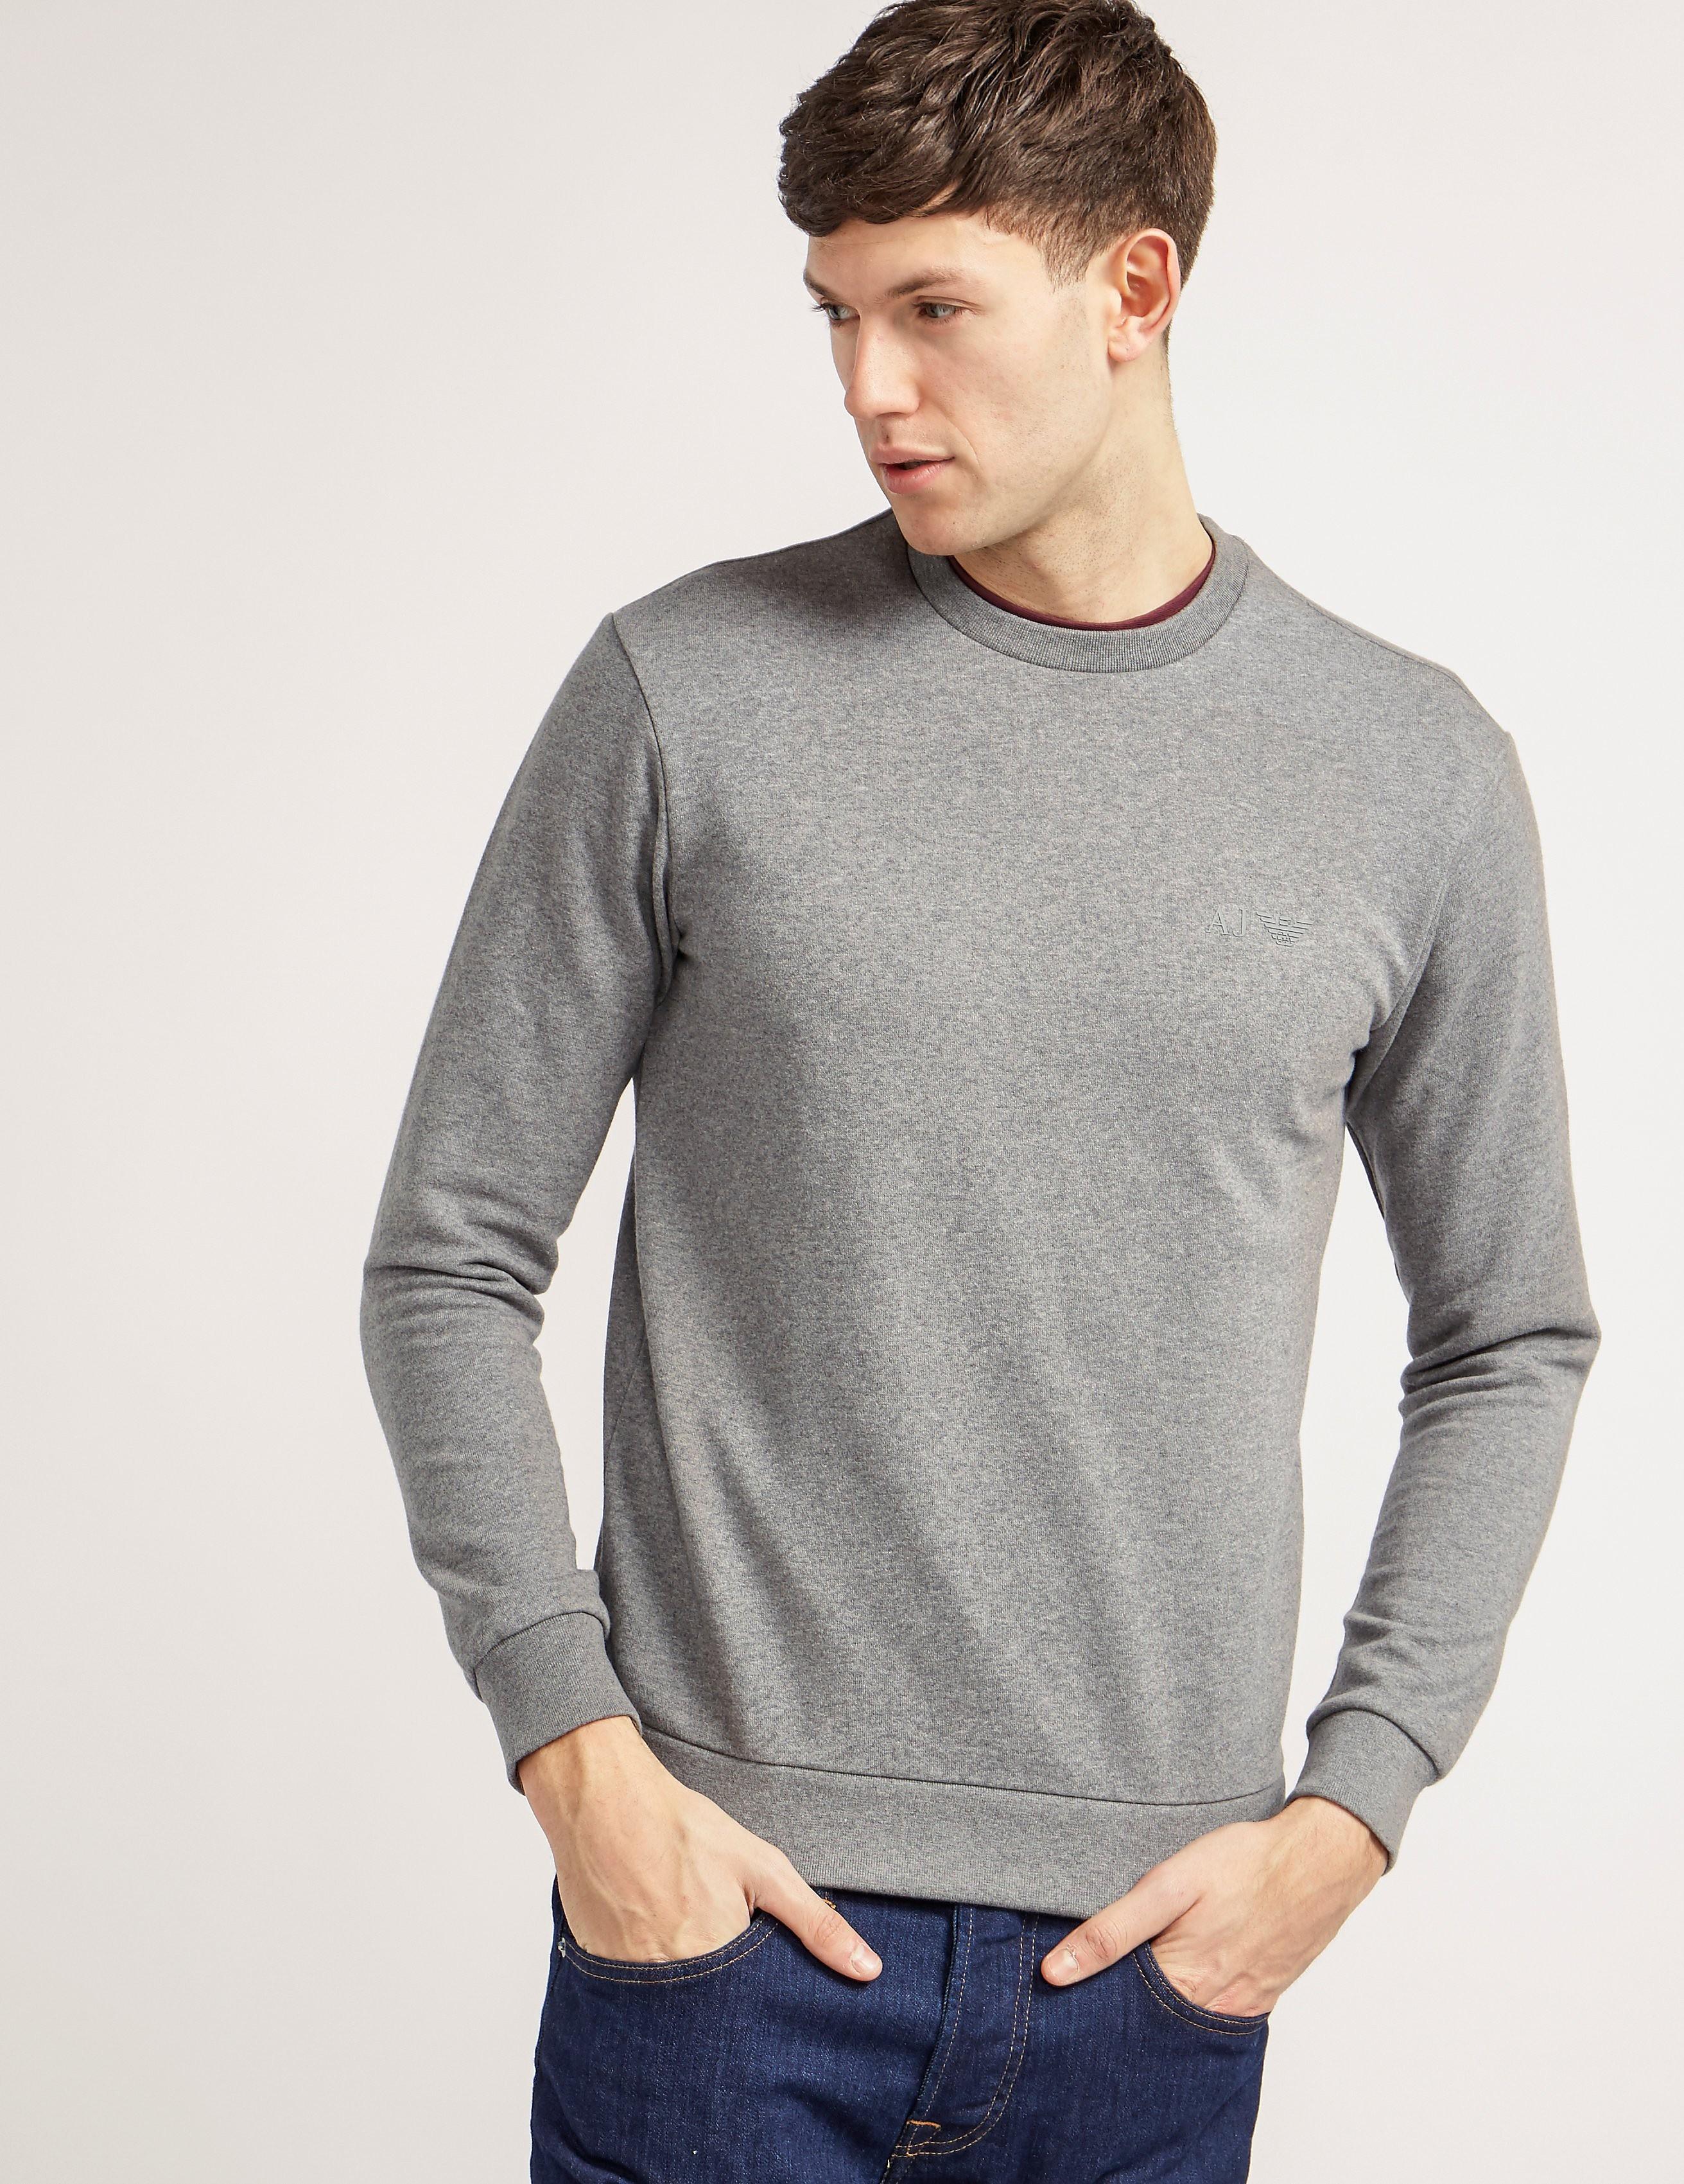 Armani Jeans Basic Crew Sweatshirt